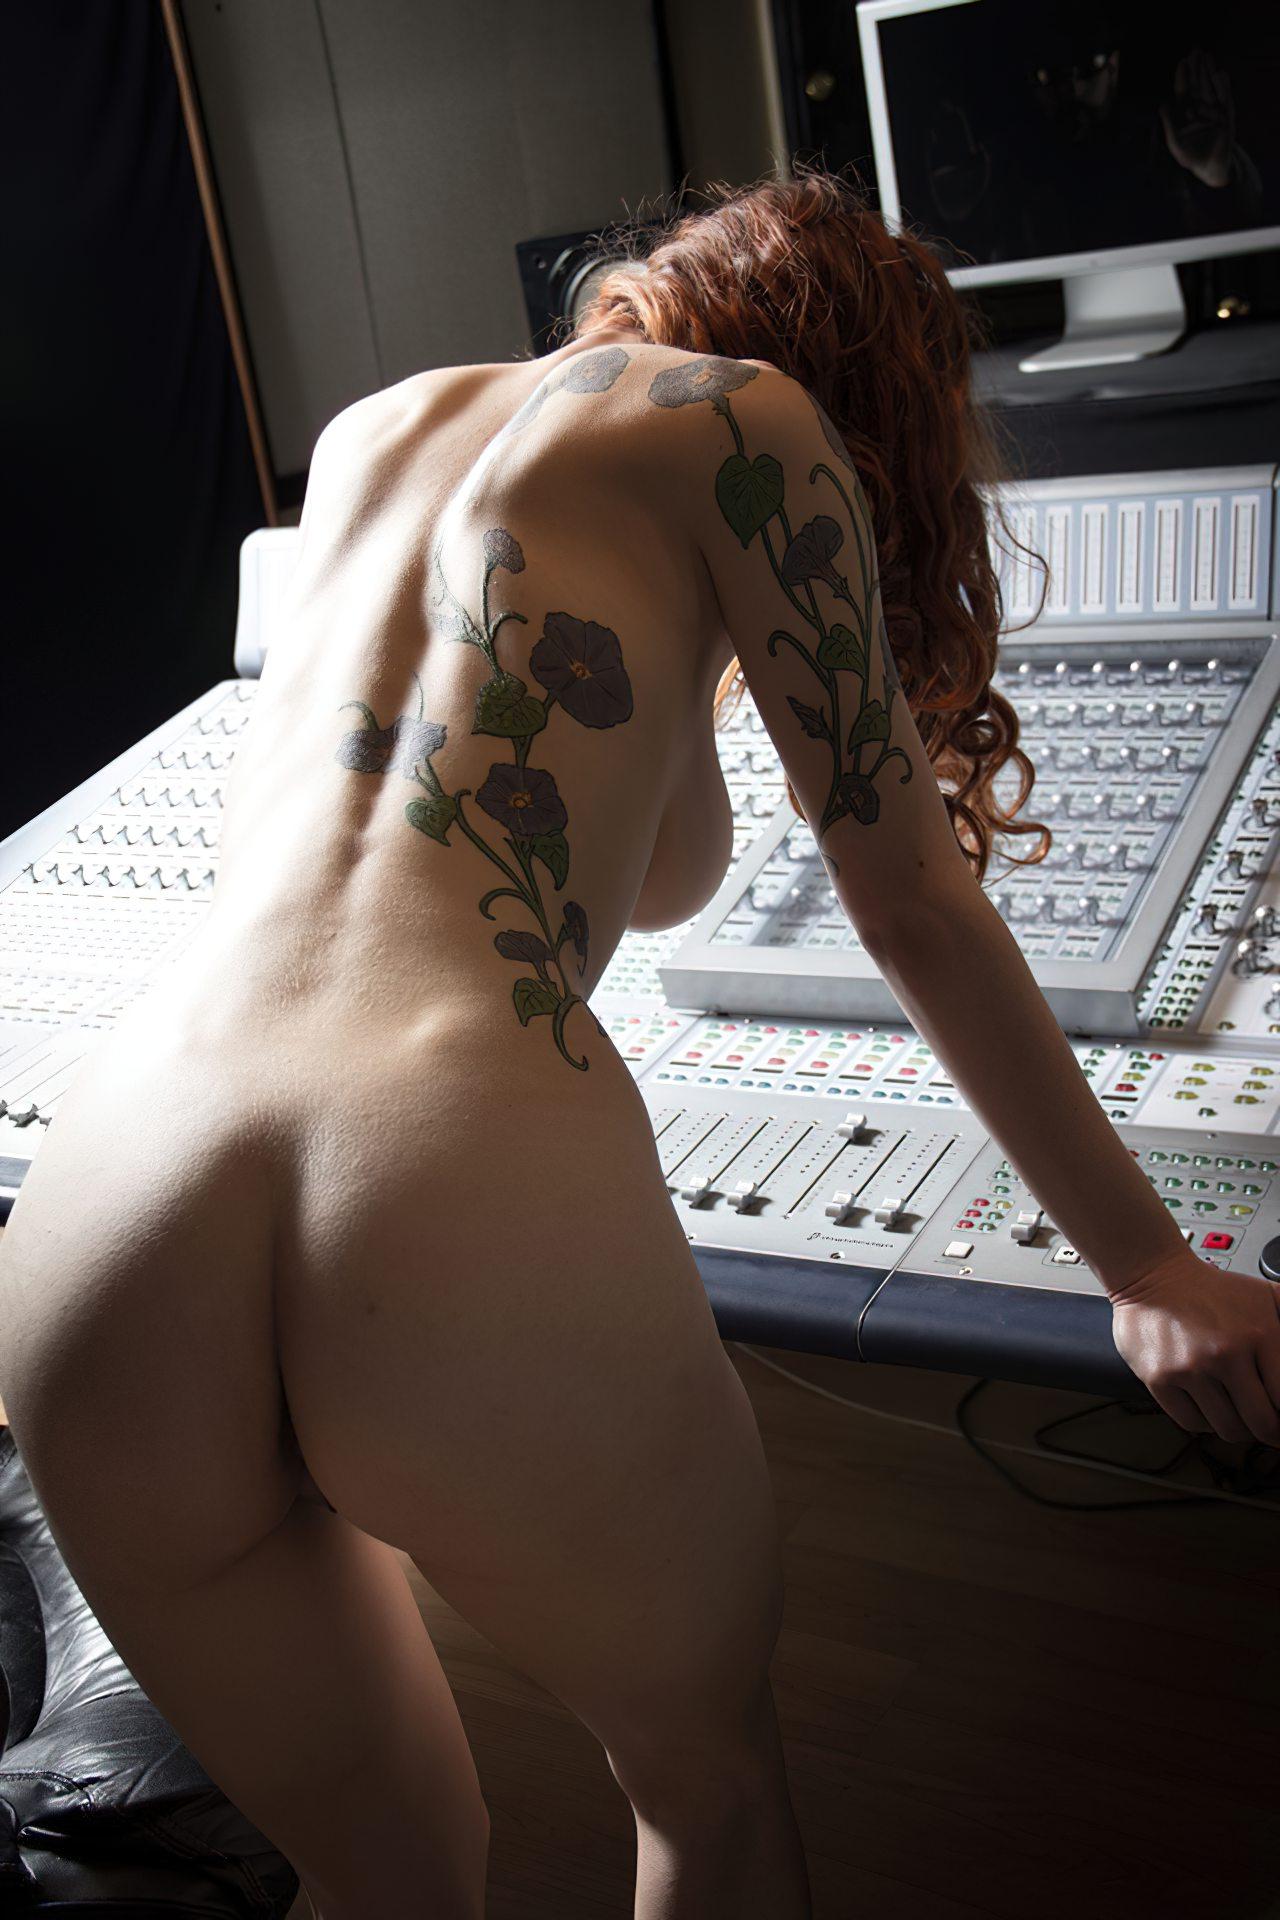 Fotos de Mulheres Despidas (27)